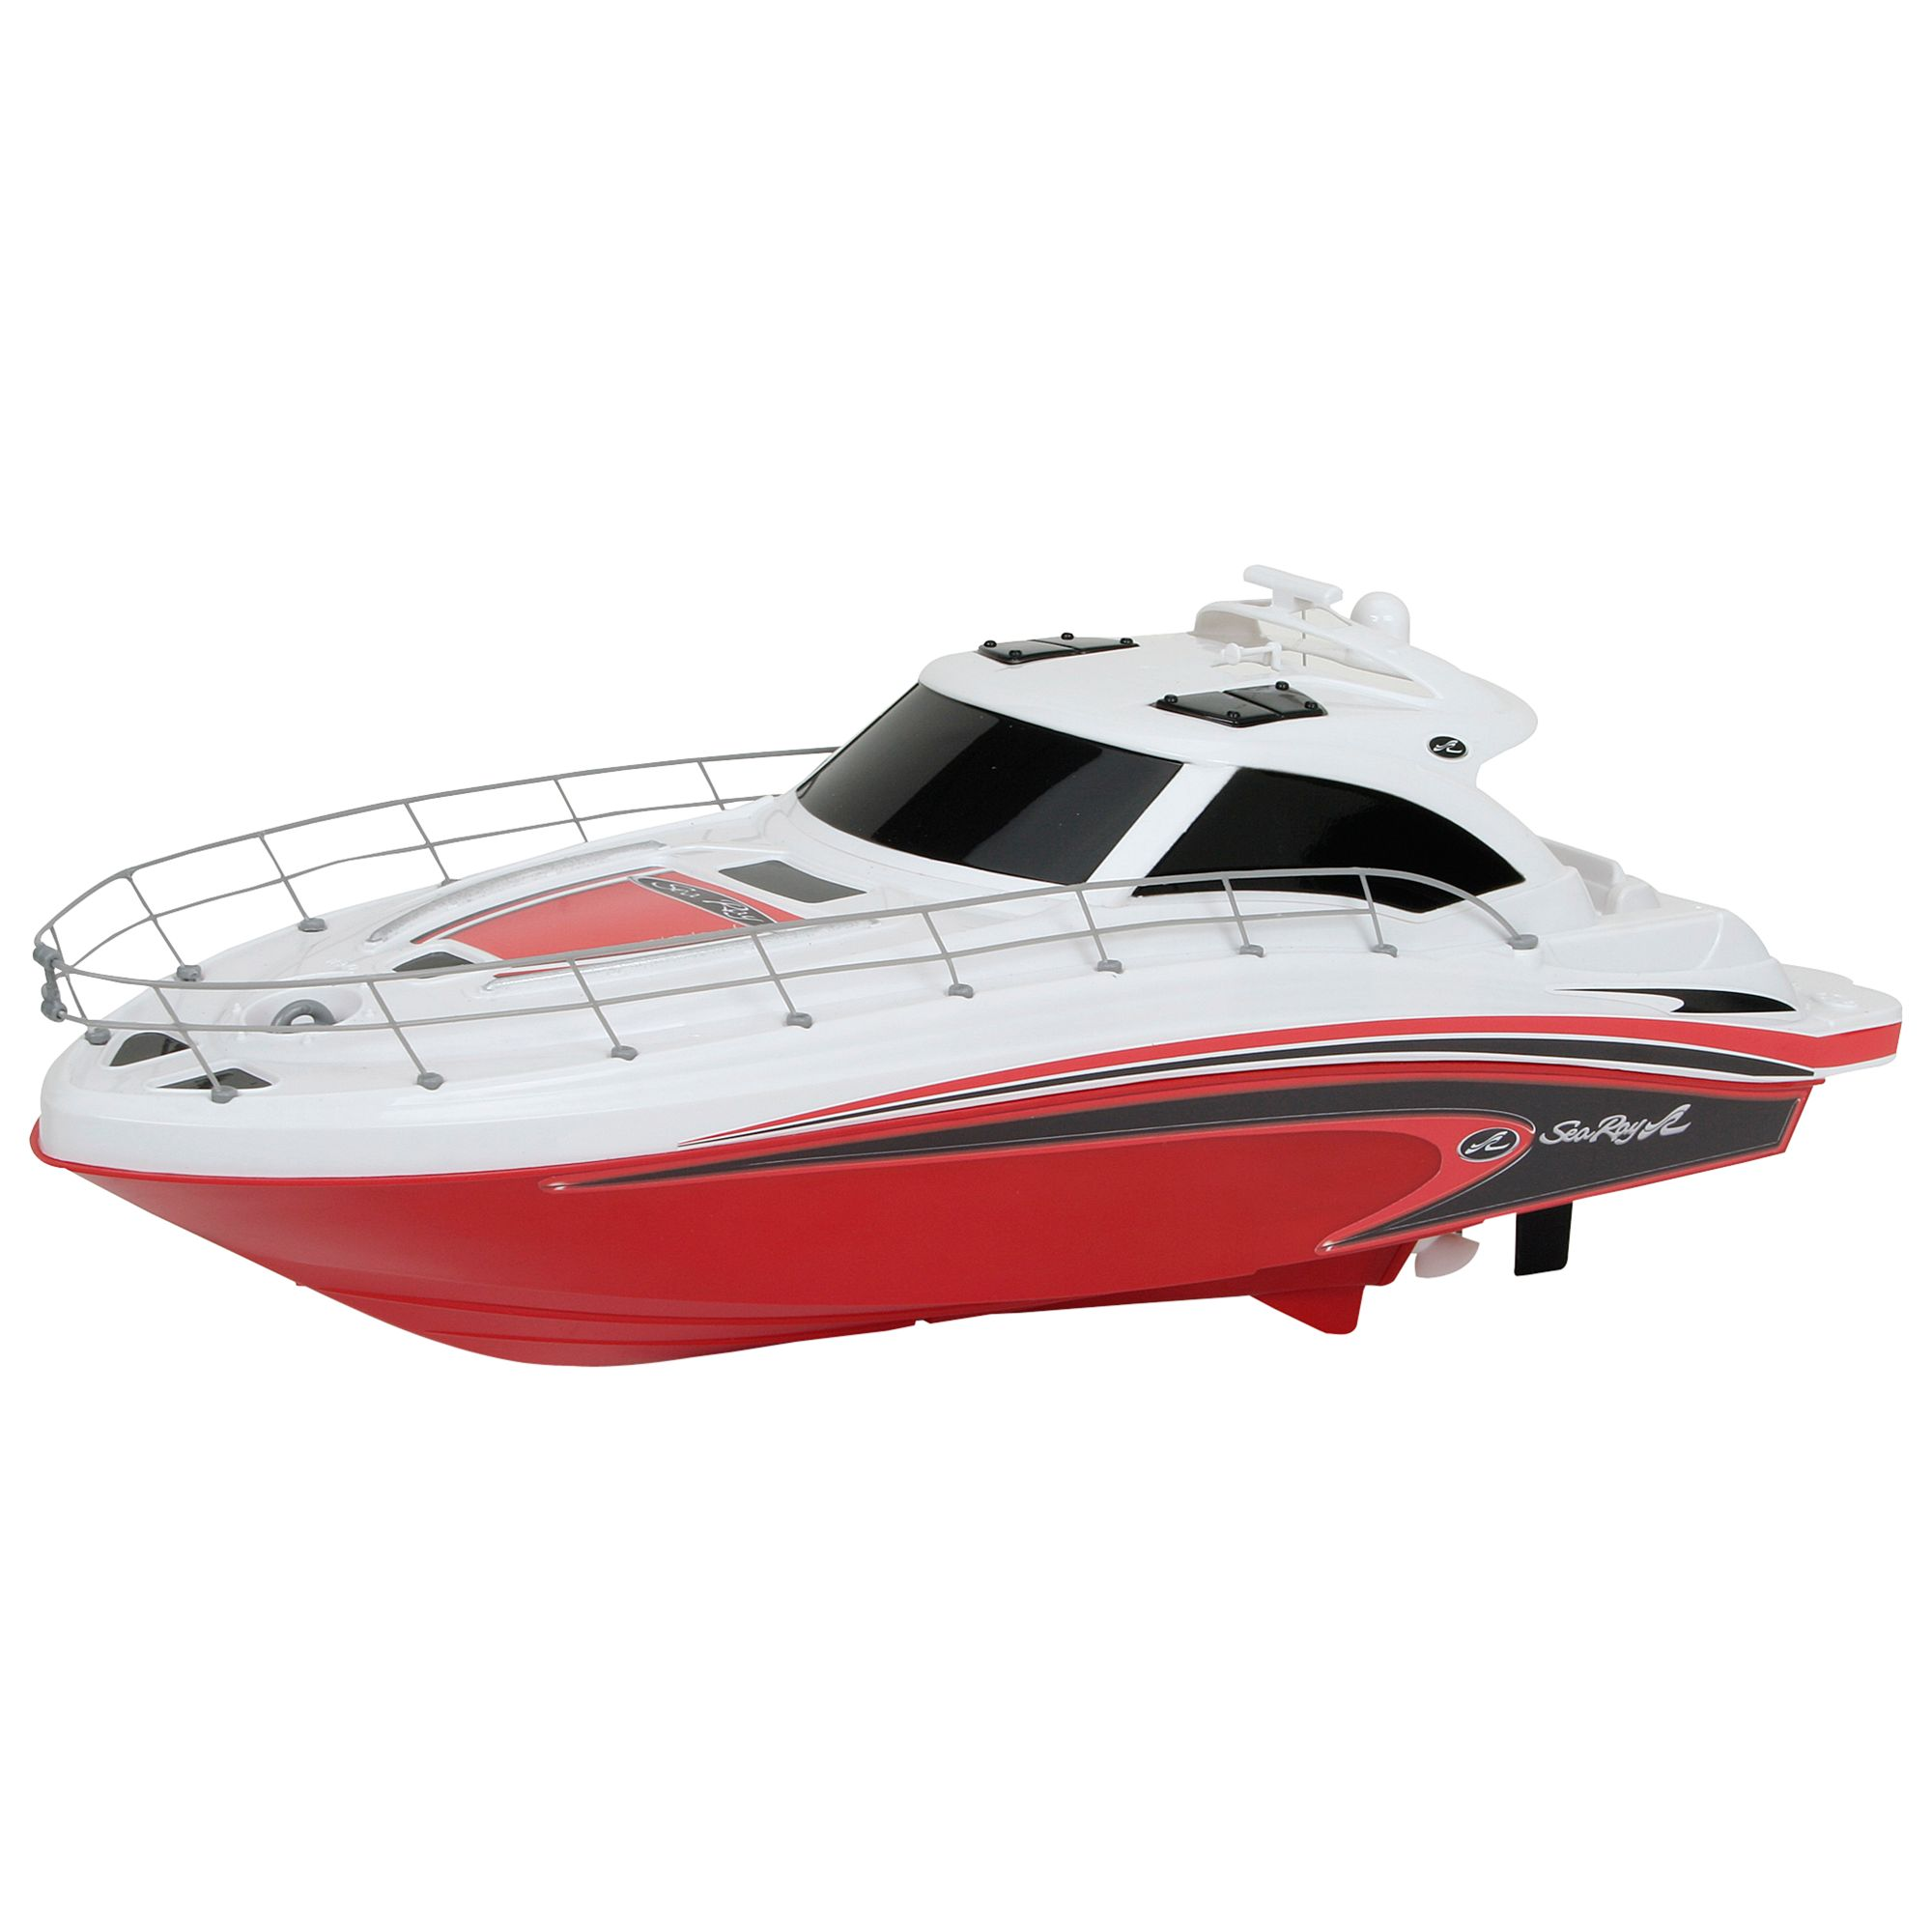 New Bright New Bright Radio Controlled Sea Ray Boat